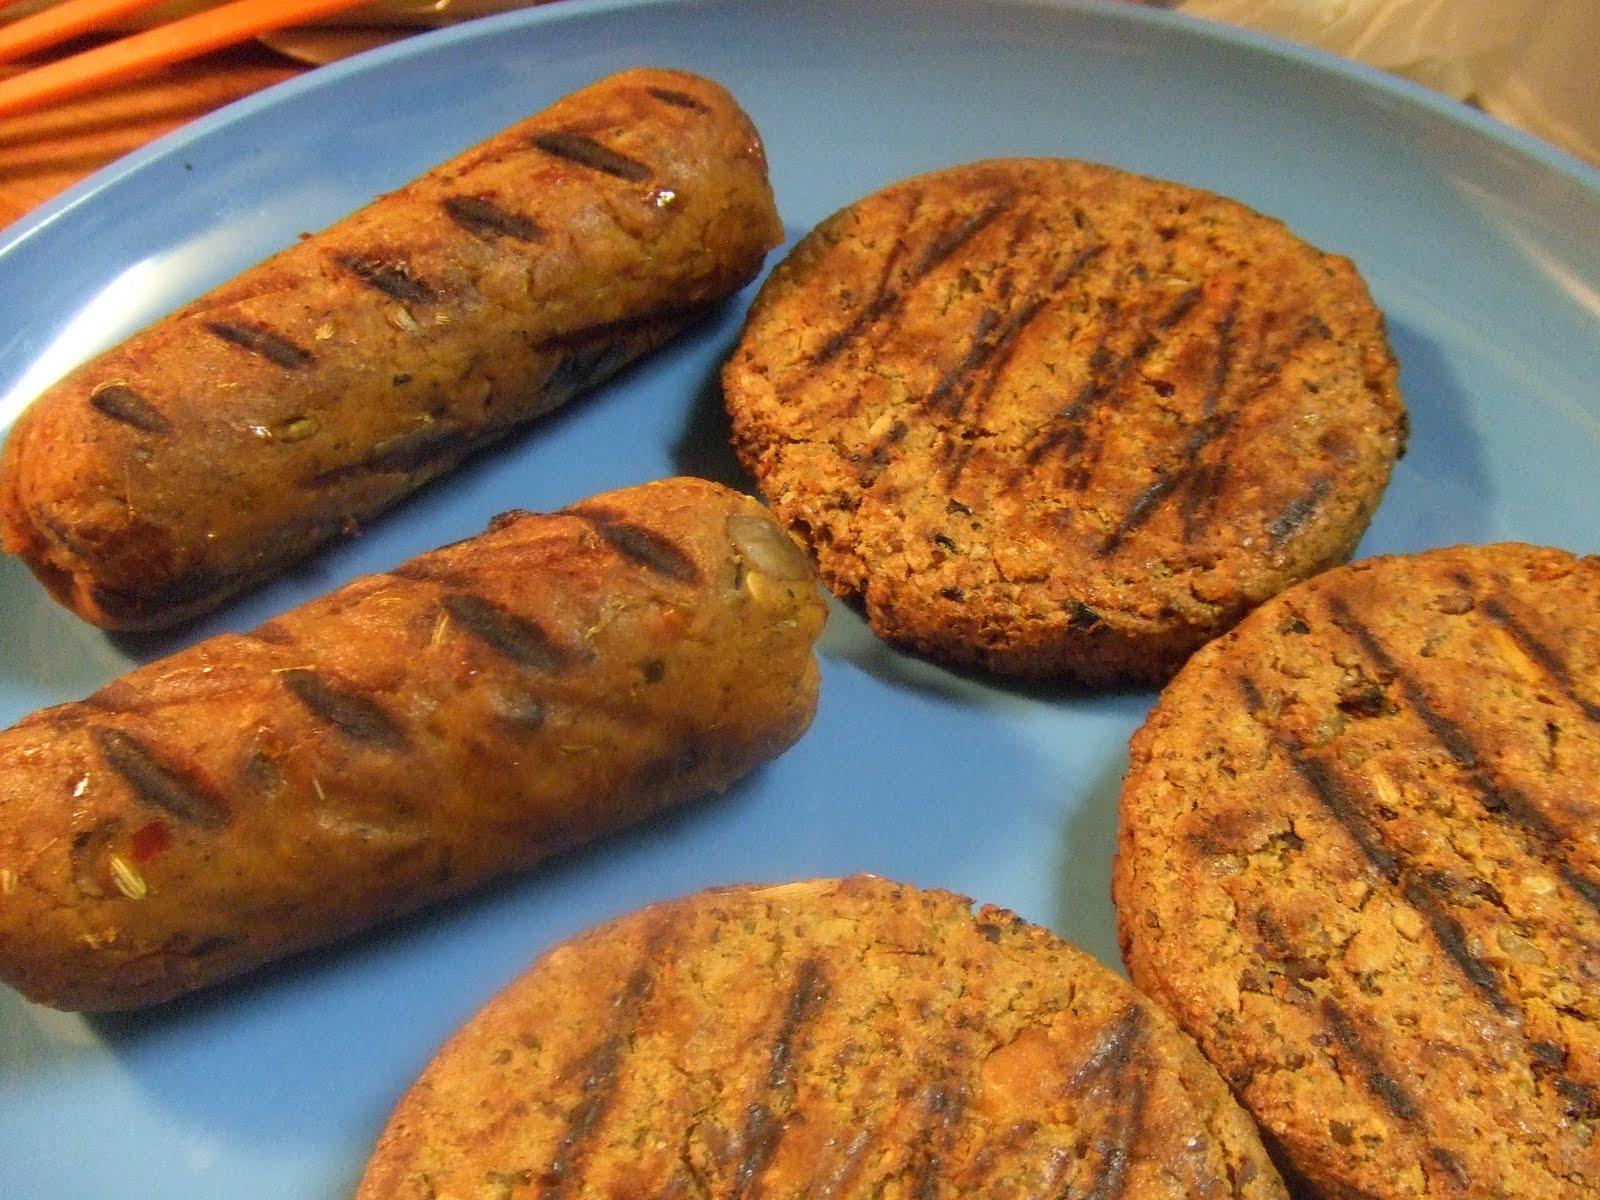 Vegan Italian Sausage Recipes  Extreme Vegan Makeover Gluten Free Spicy Italian Sausages